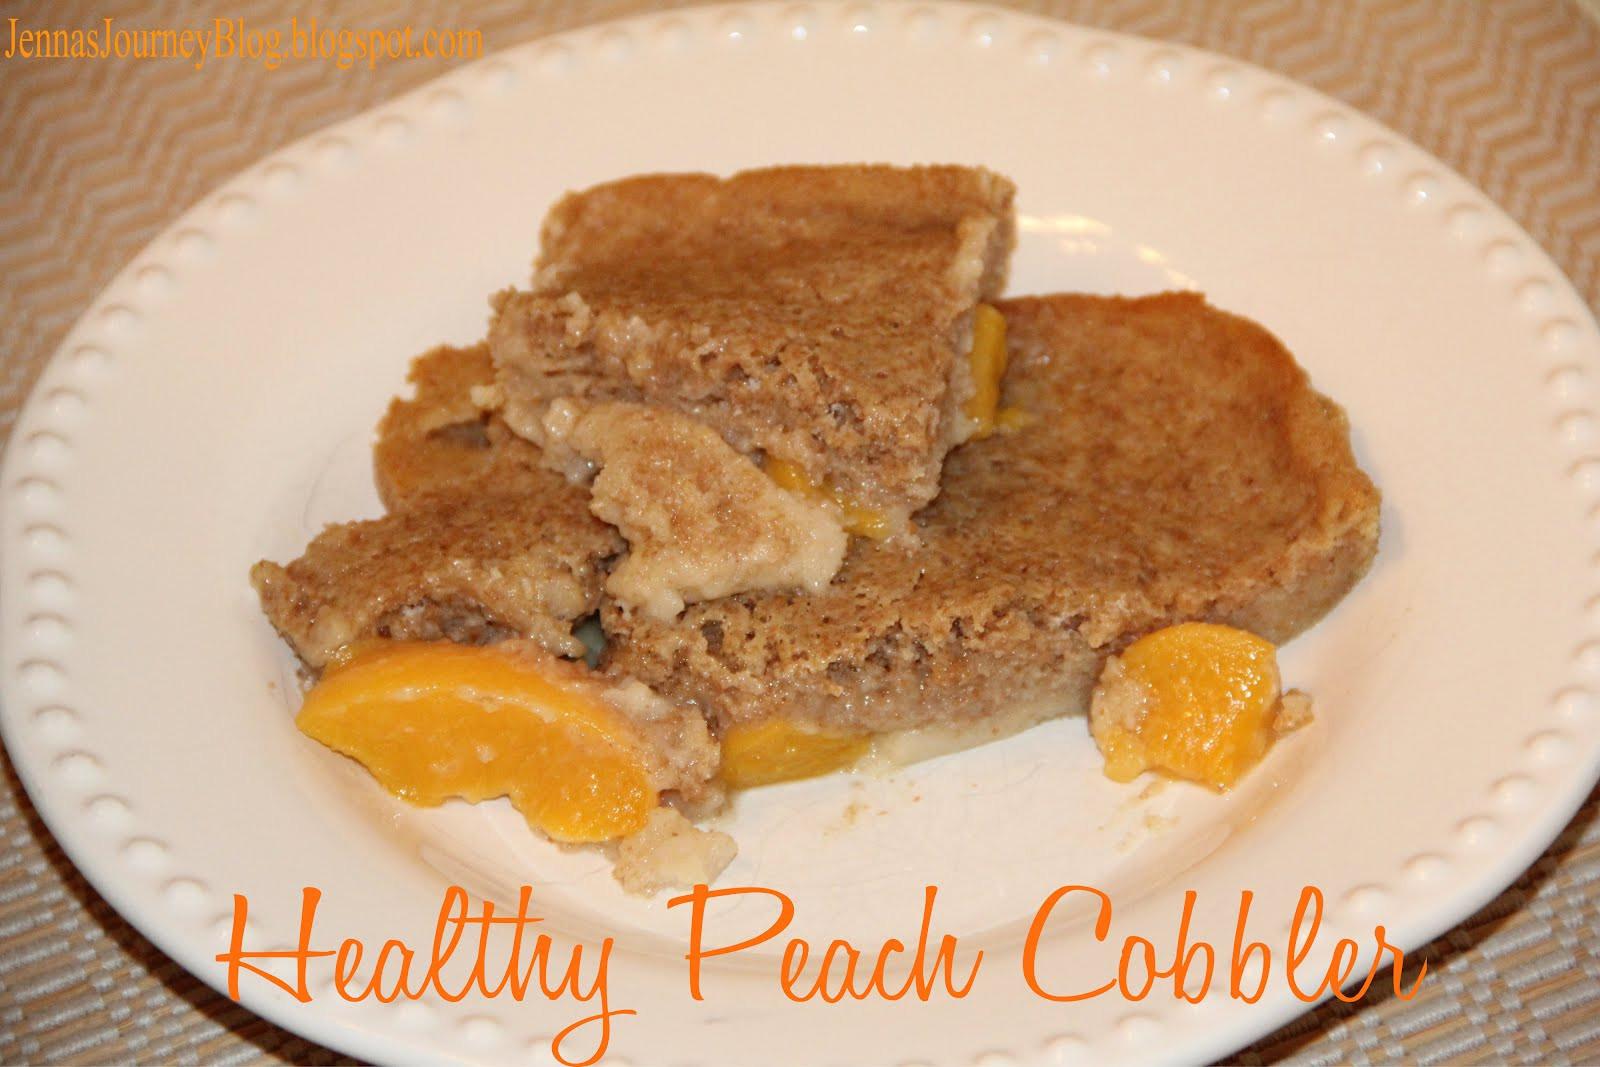 Healthy Peach Desserts  Jenna Blogs Healthy Peach Cobbler